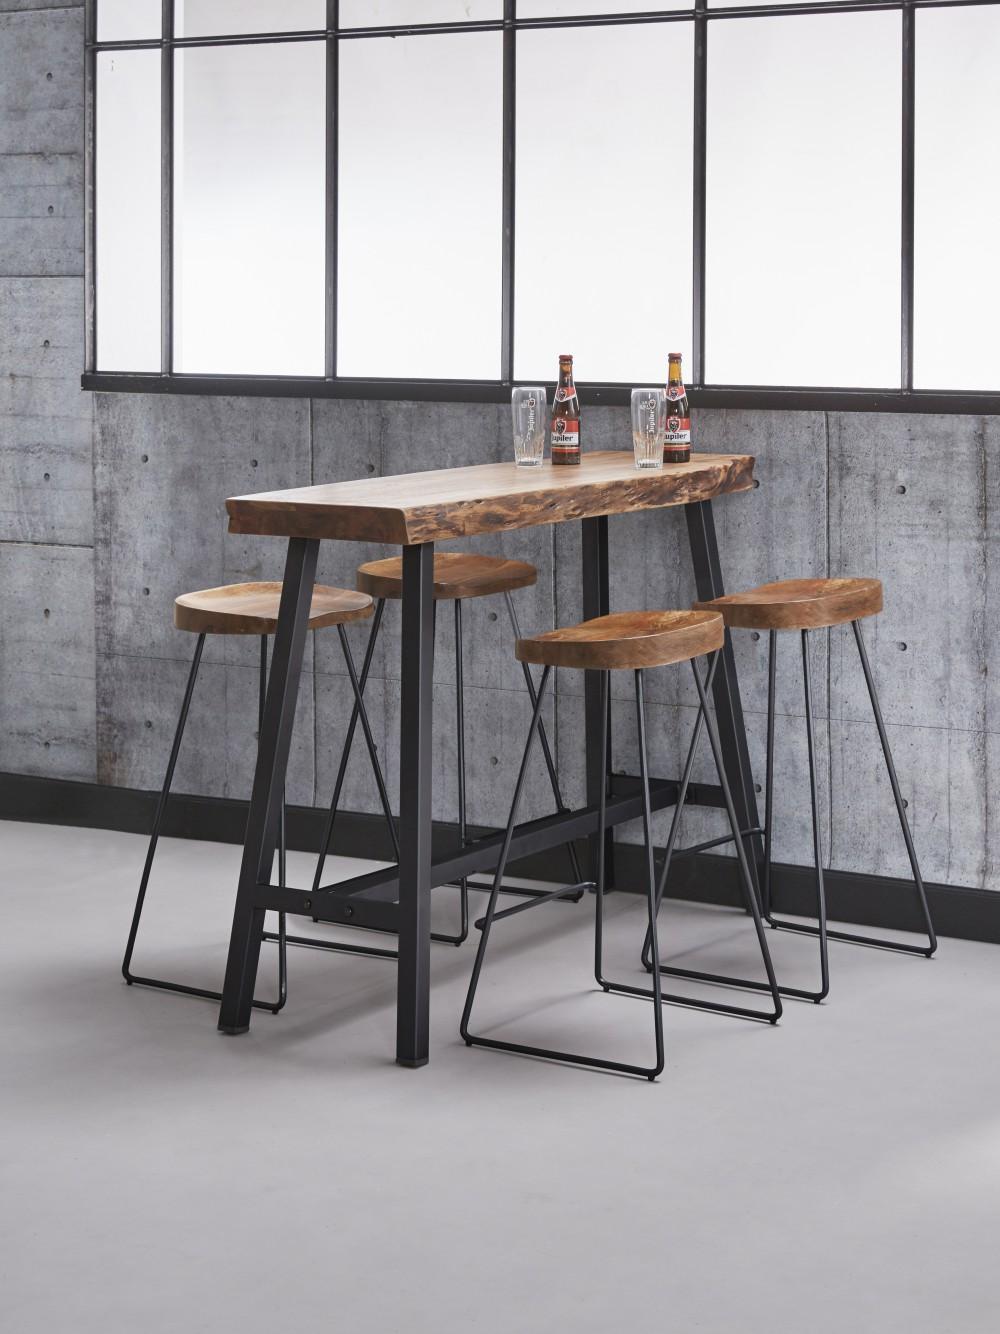 Barhocker Industrie Holz Schale Hocker Metall Industriedesign Sitzhohe 70 Cm